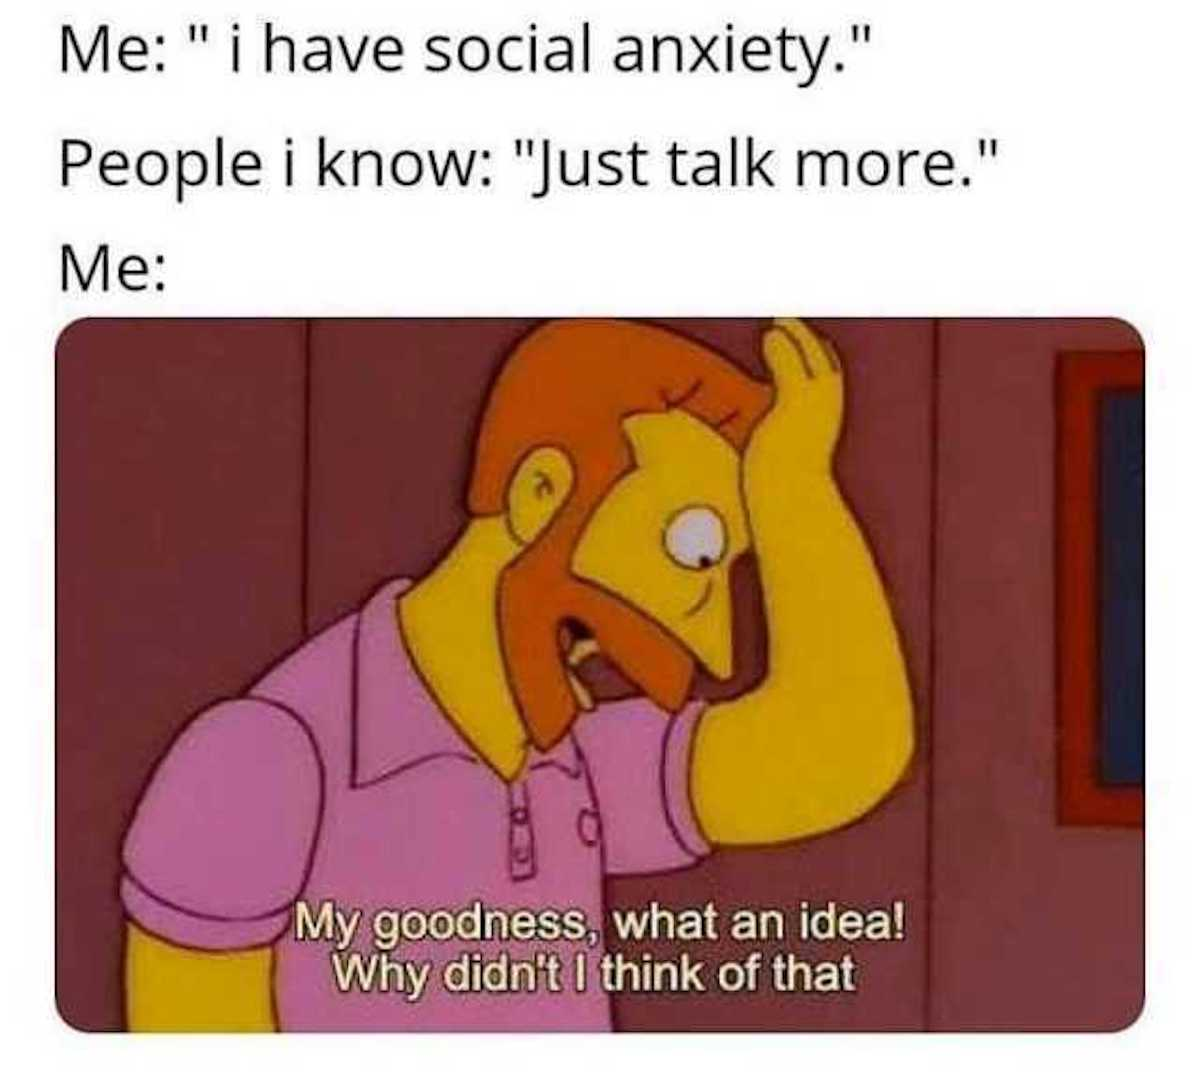 mental health memes, do they really help?